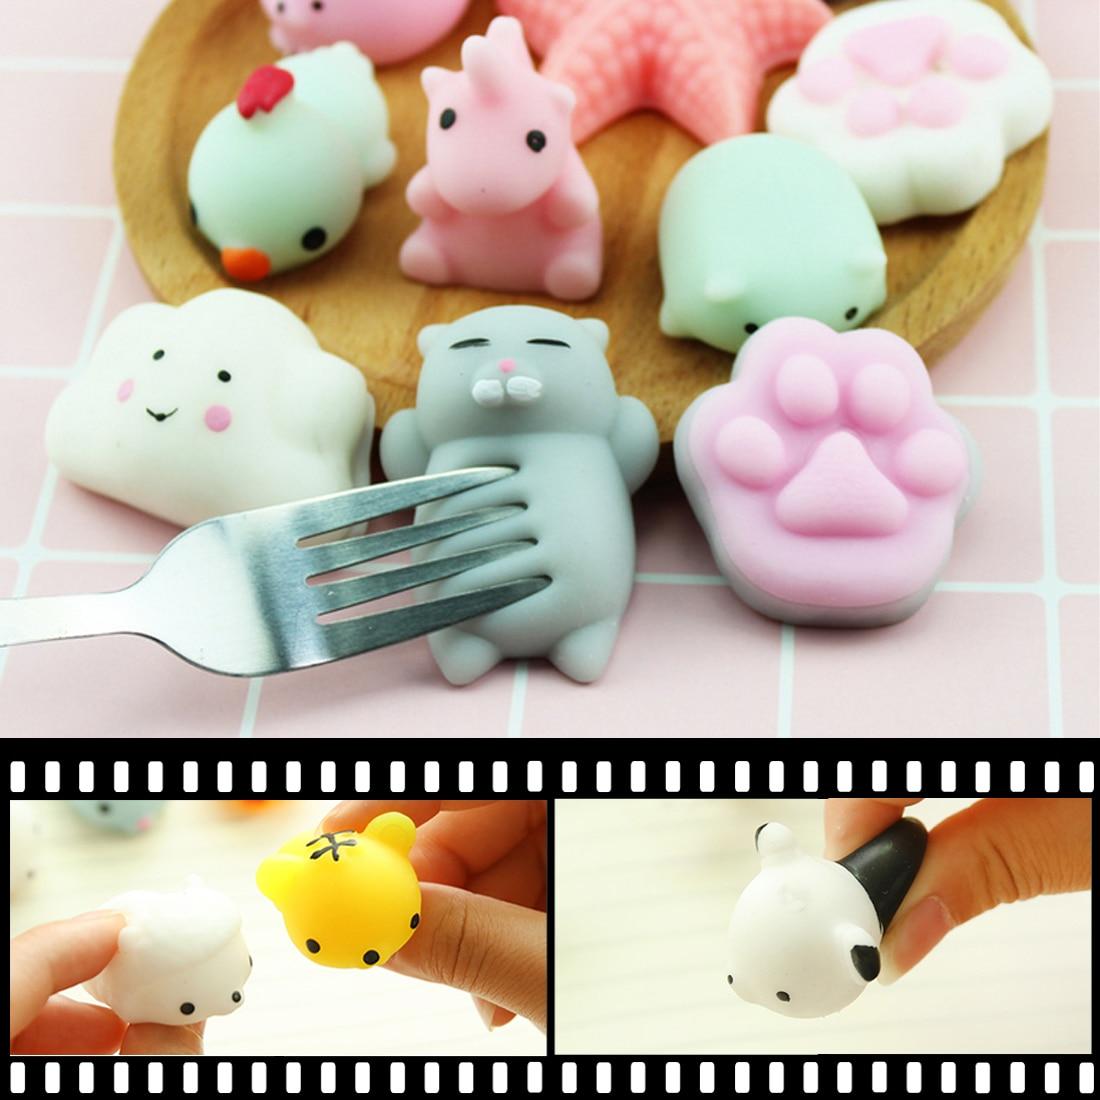 Etmakit Mini Squishy Kawaii Seal Cute Phone Straps Slow Rising Soft Press Squeeze Kawaii Bread Kids Toy Phone DIY Accessories